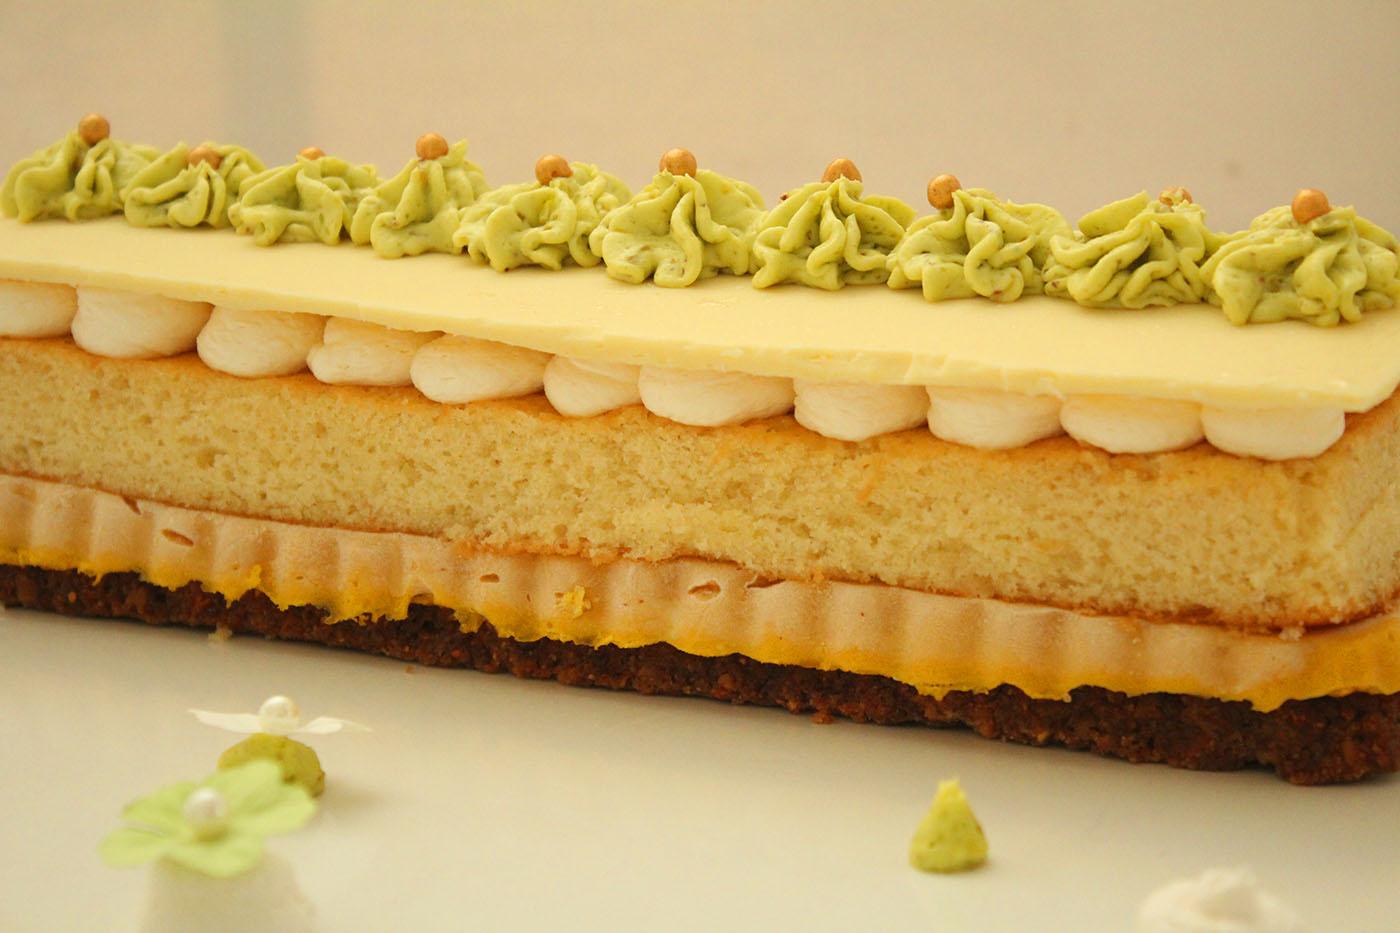 IMG 9282 - עוגת שכבות אקזותית